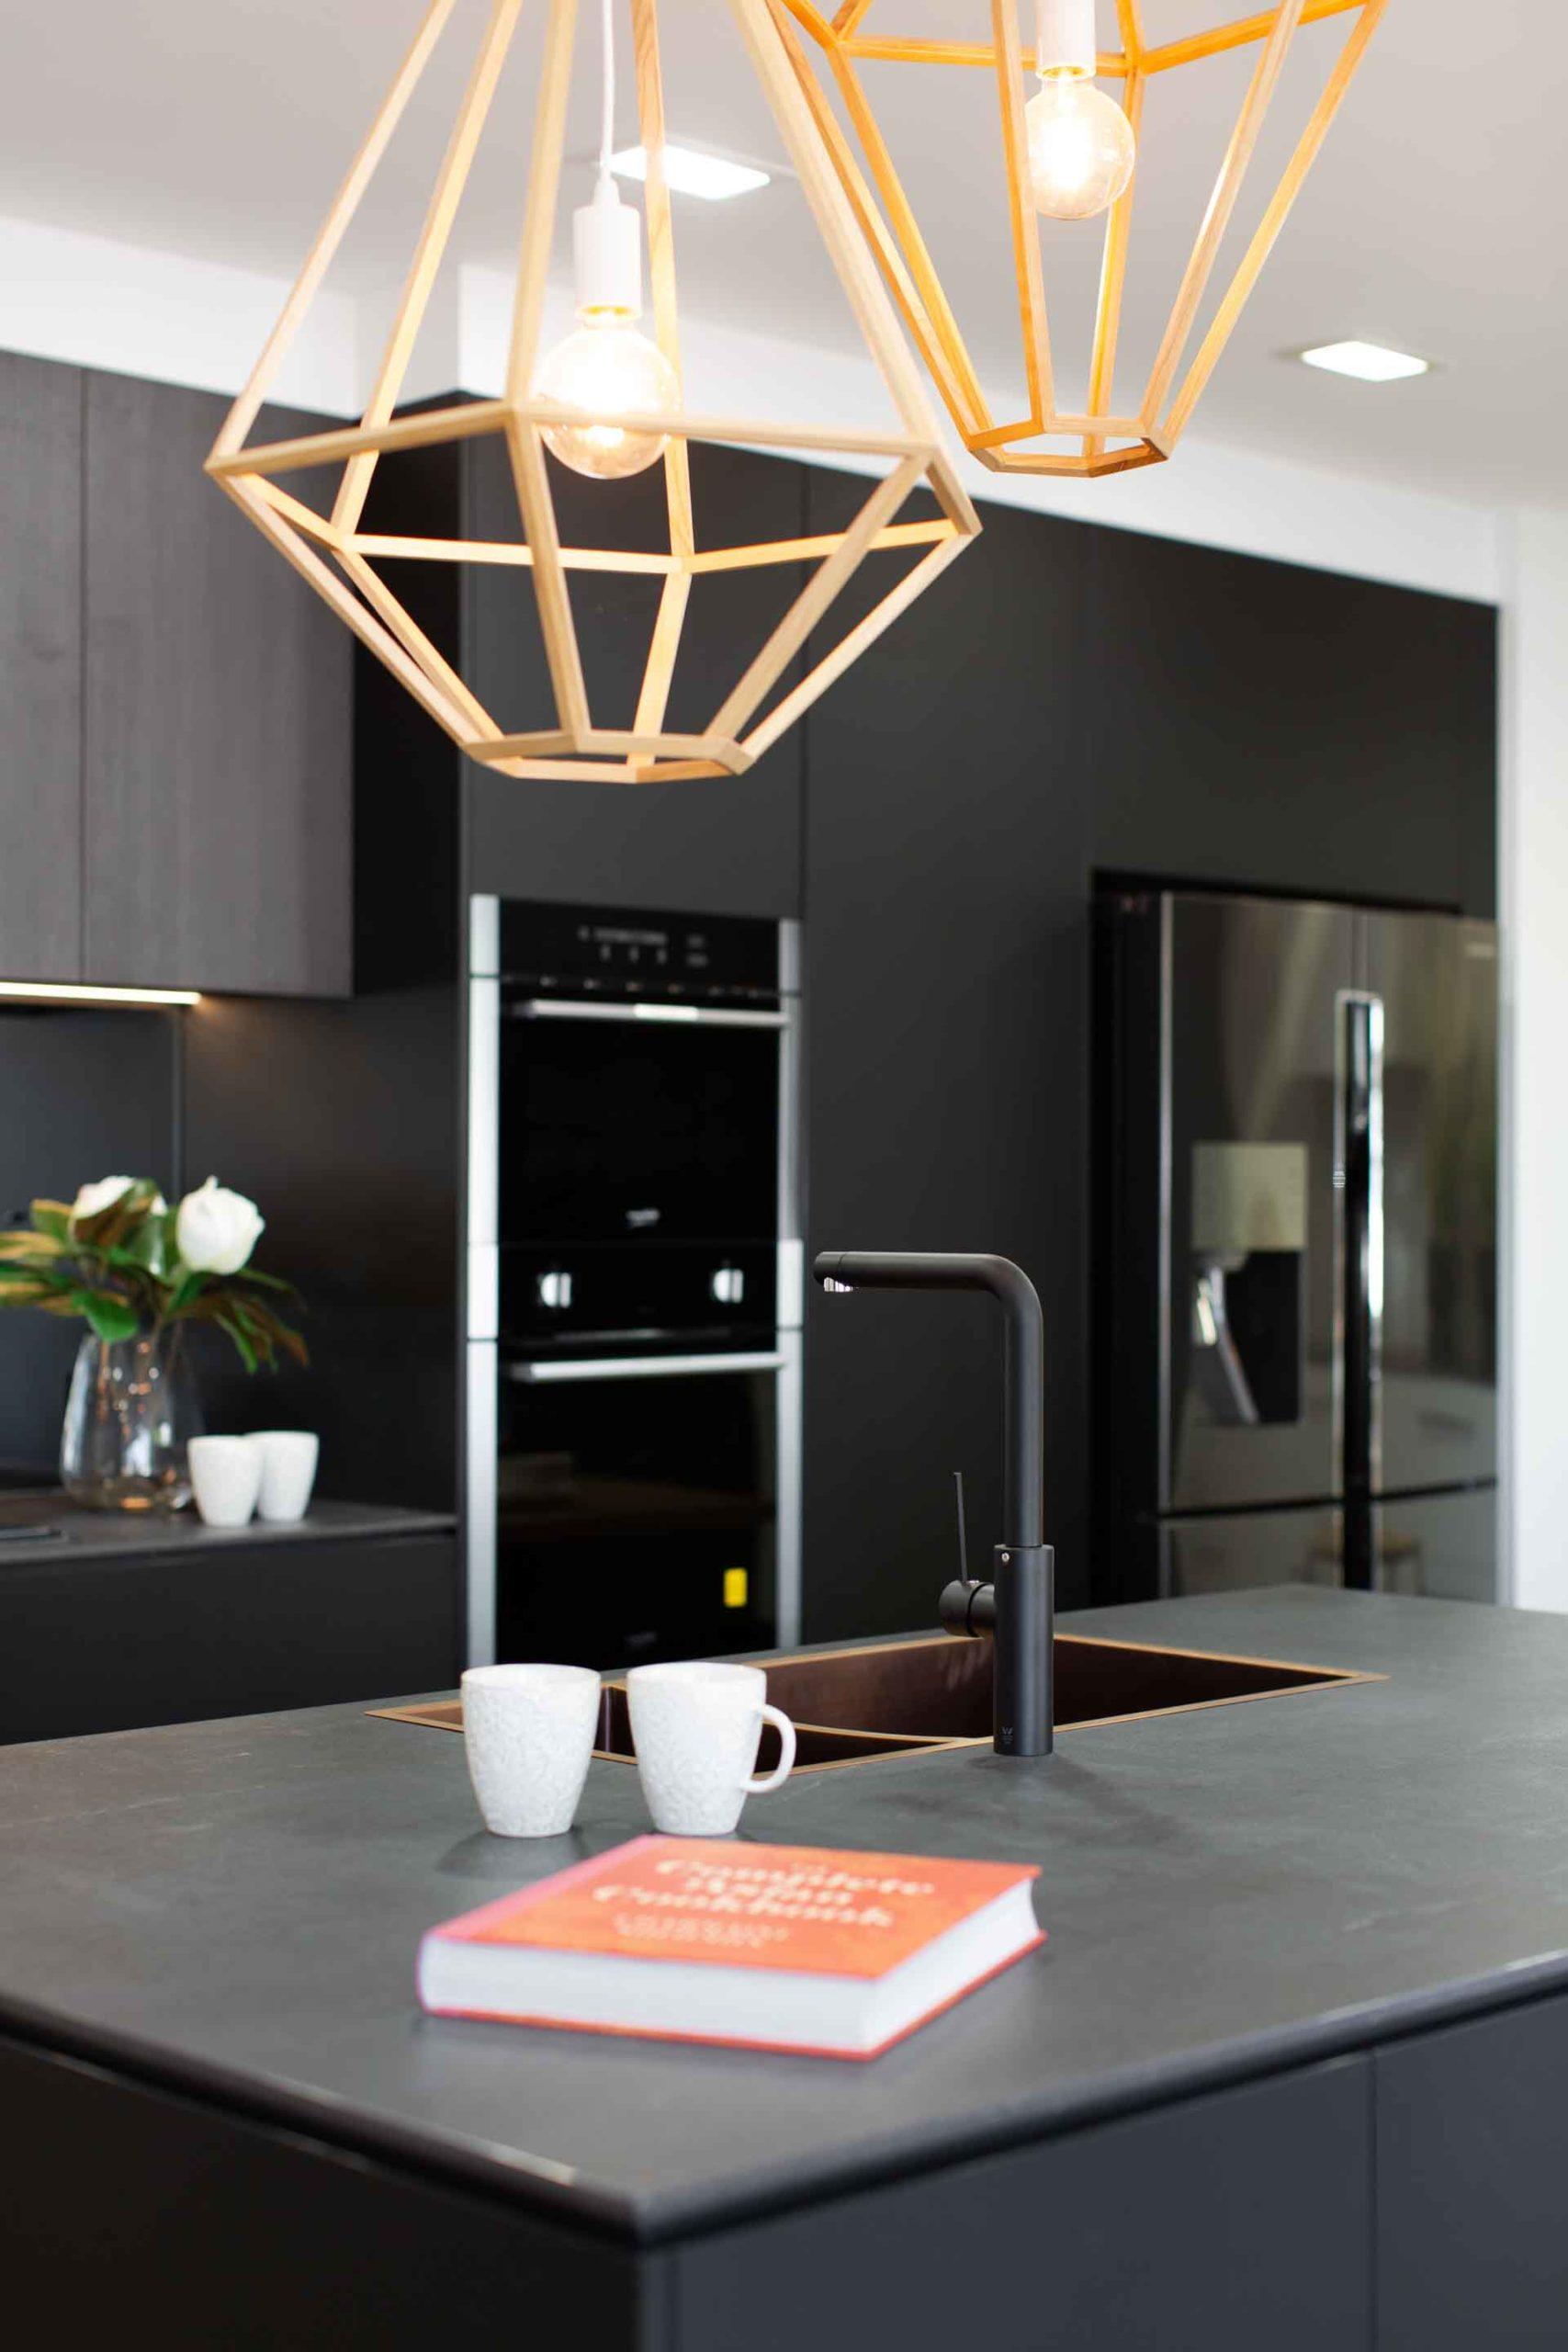 Leopard_Lens_Photography_Inarc_Design_Simson_Kitchen_Showroom-43